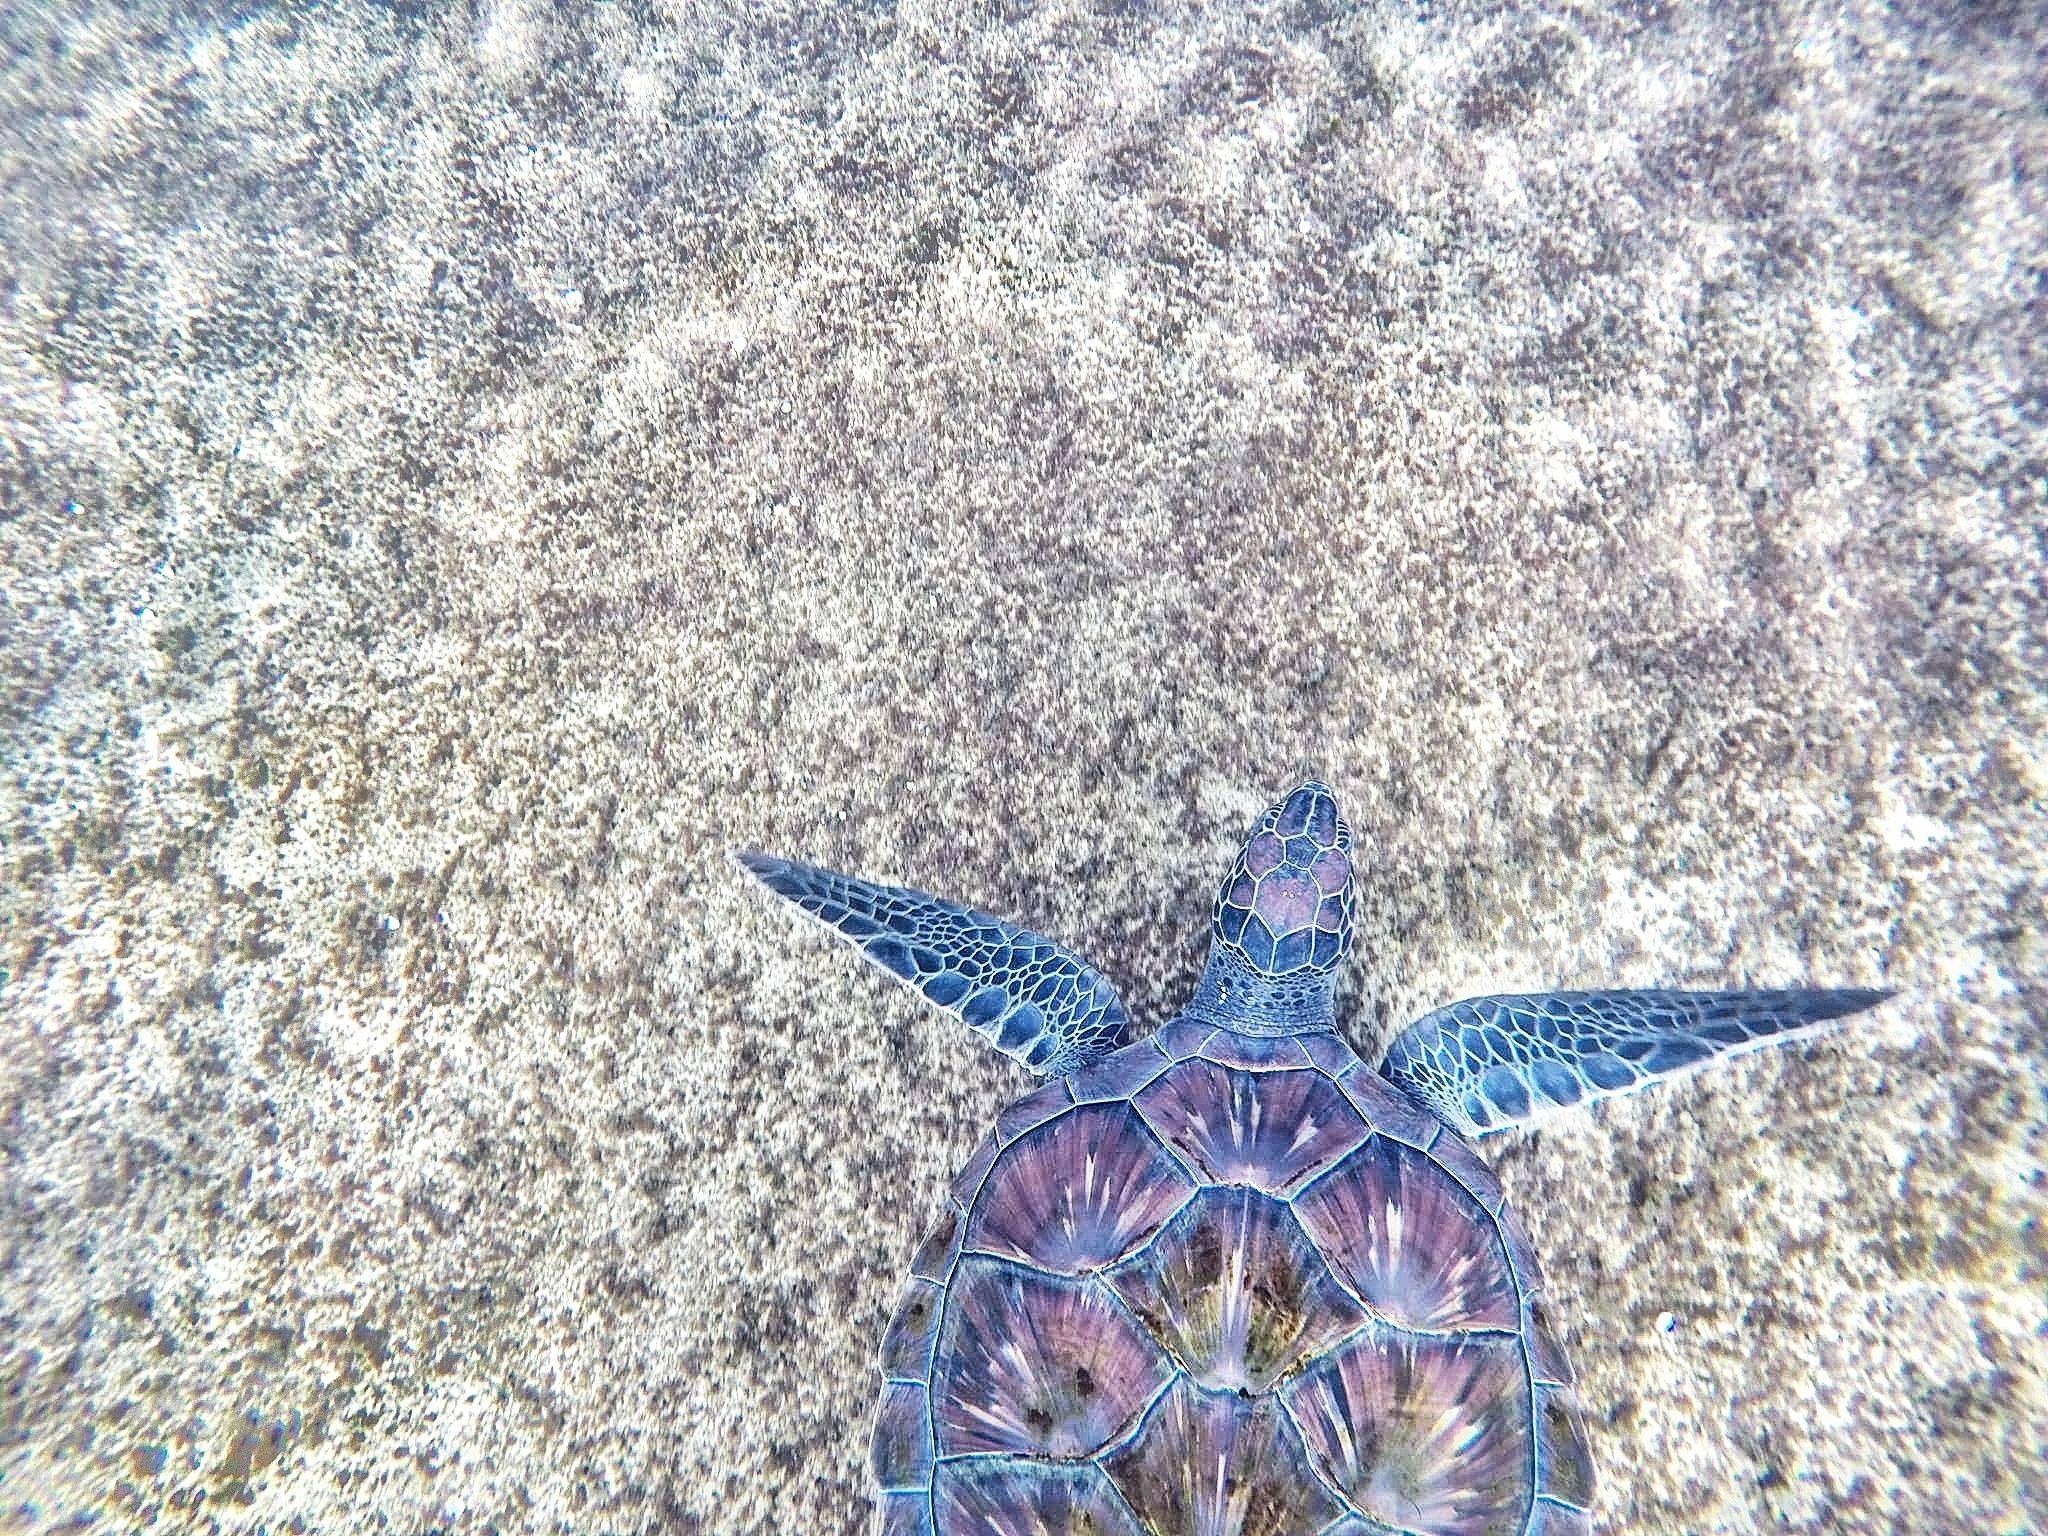 Purple and blue sea turtle photo